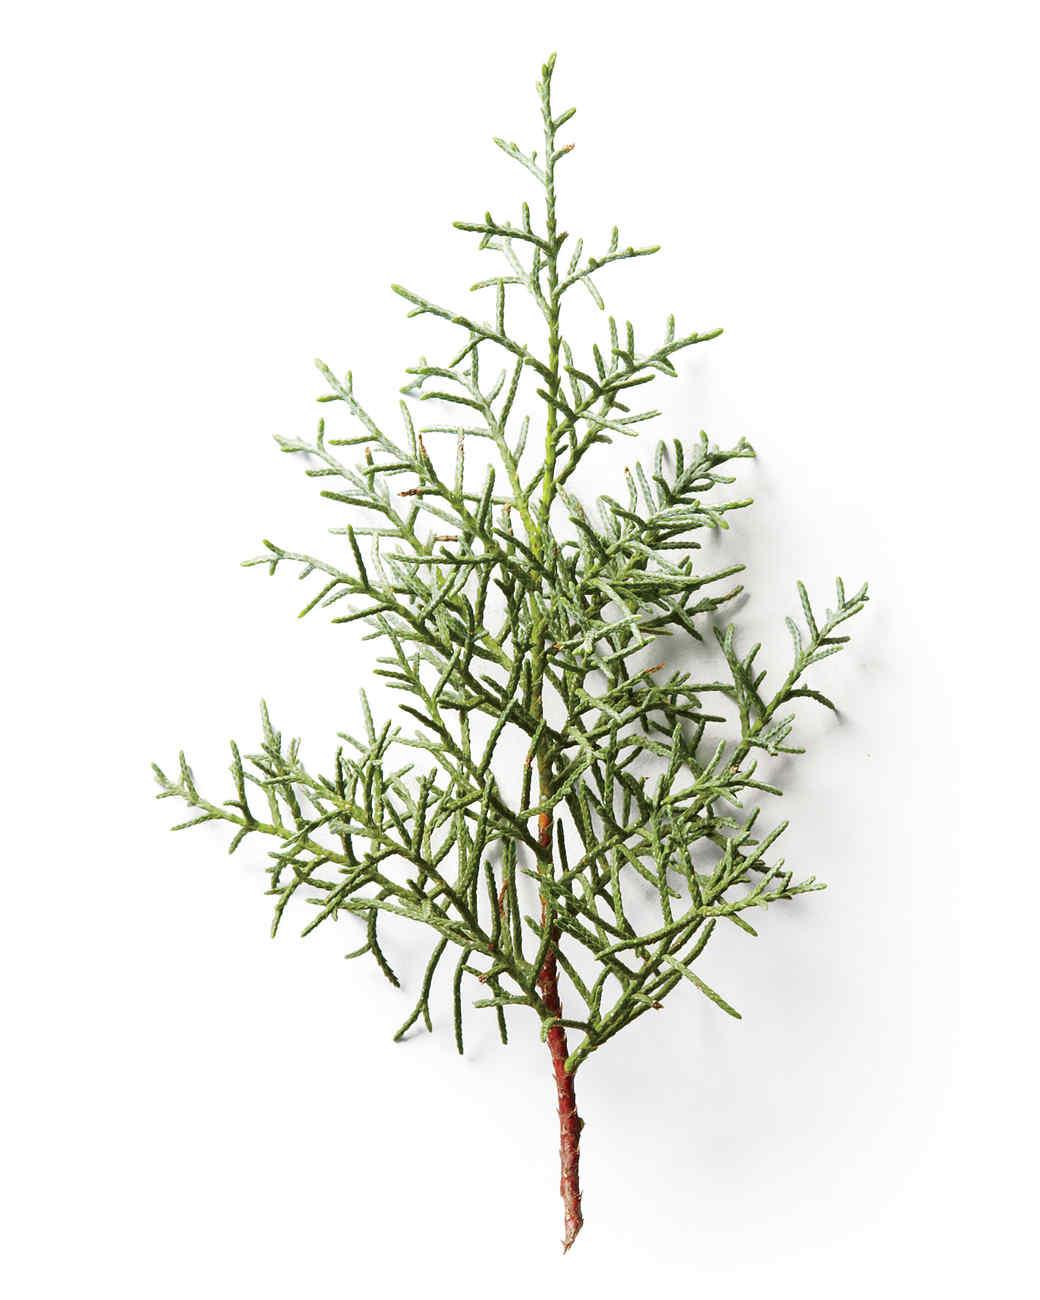 cypress-mld107876.jpg